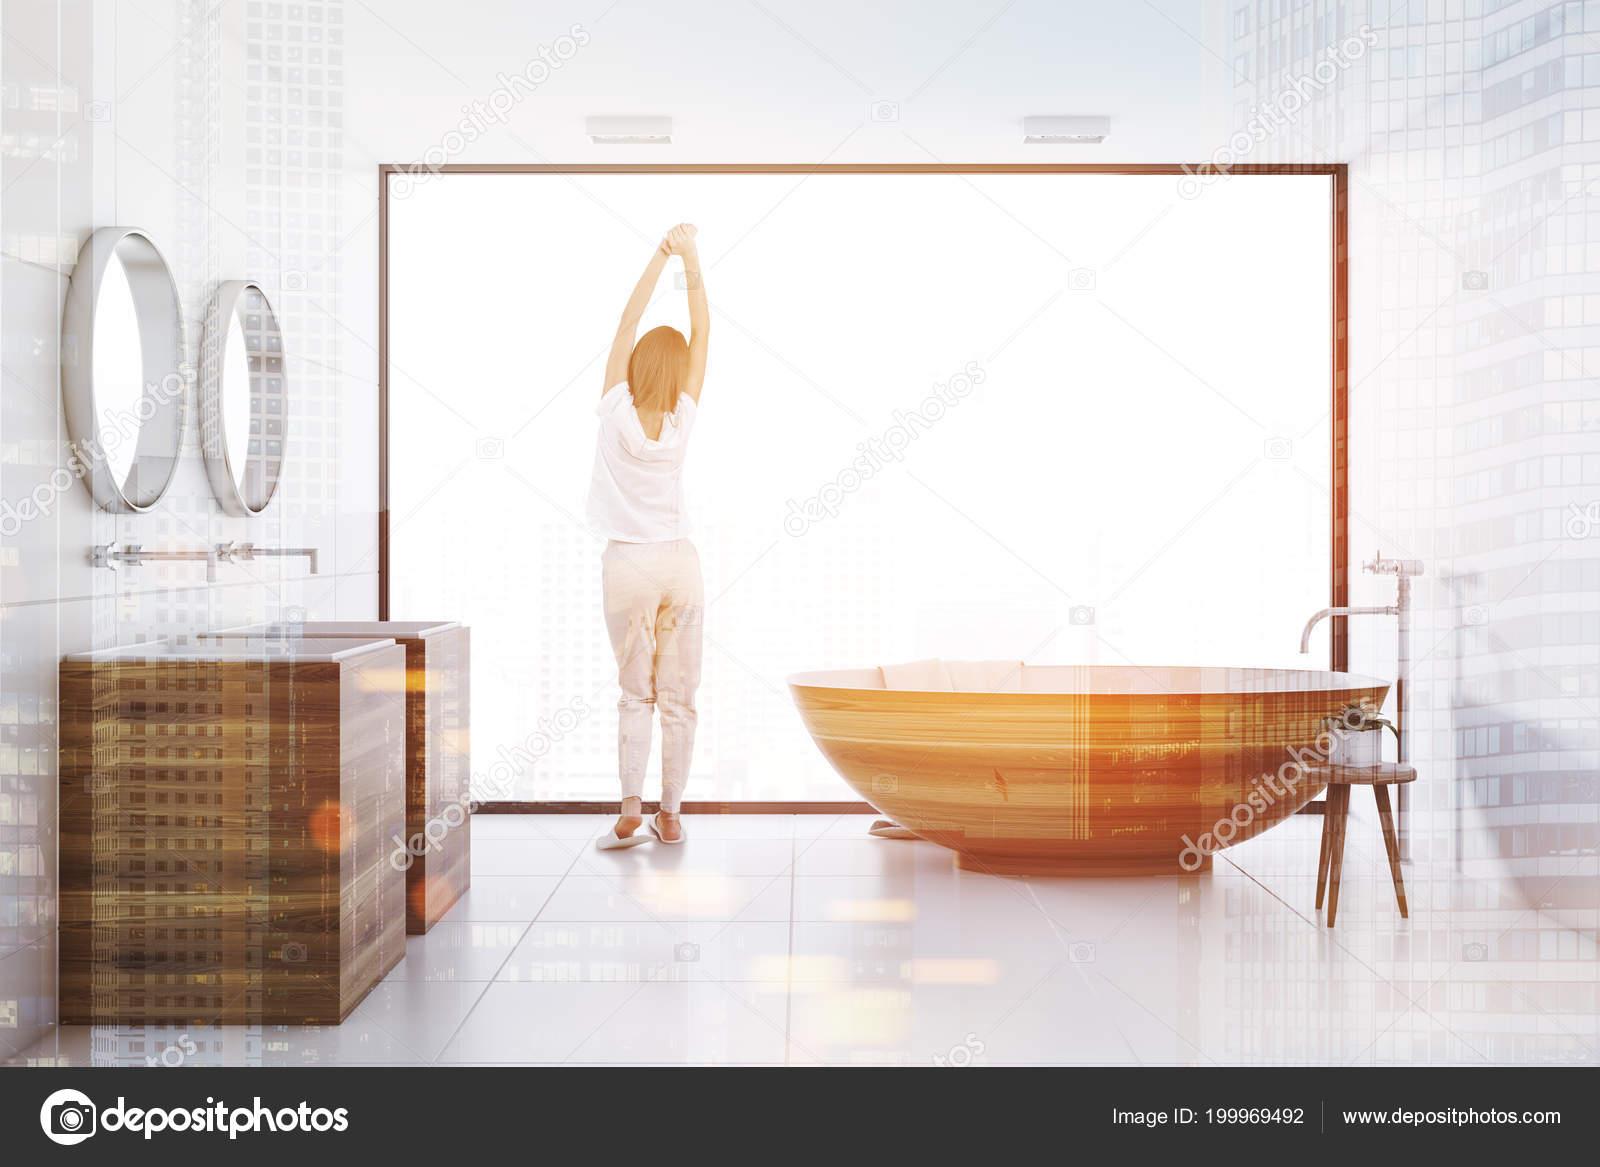 Woman Panoramic Bathroom Interior White Walls White Tile Floor ...